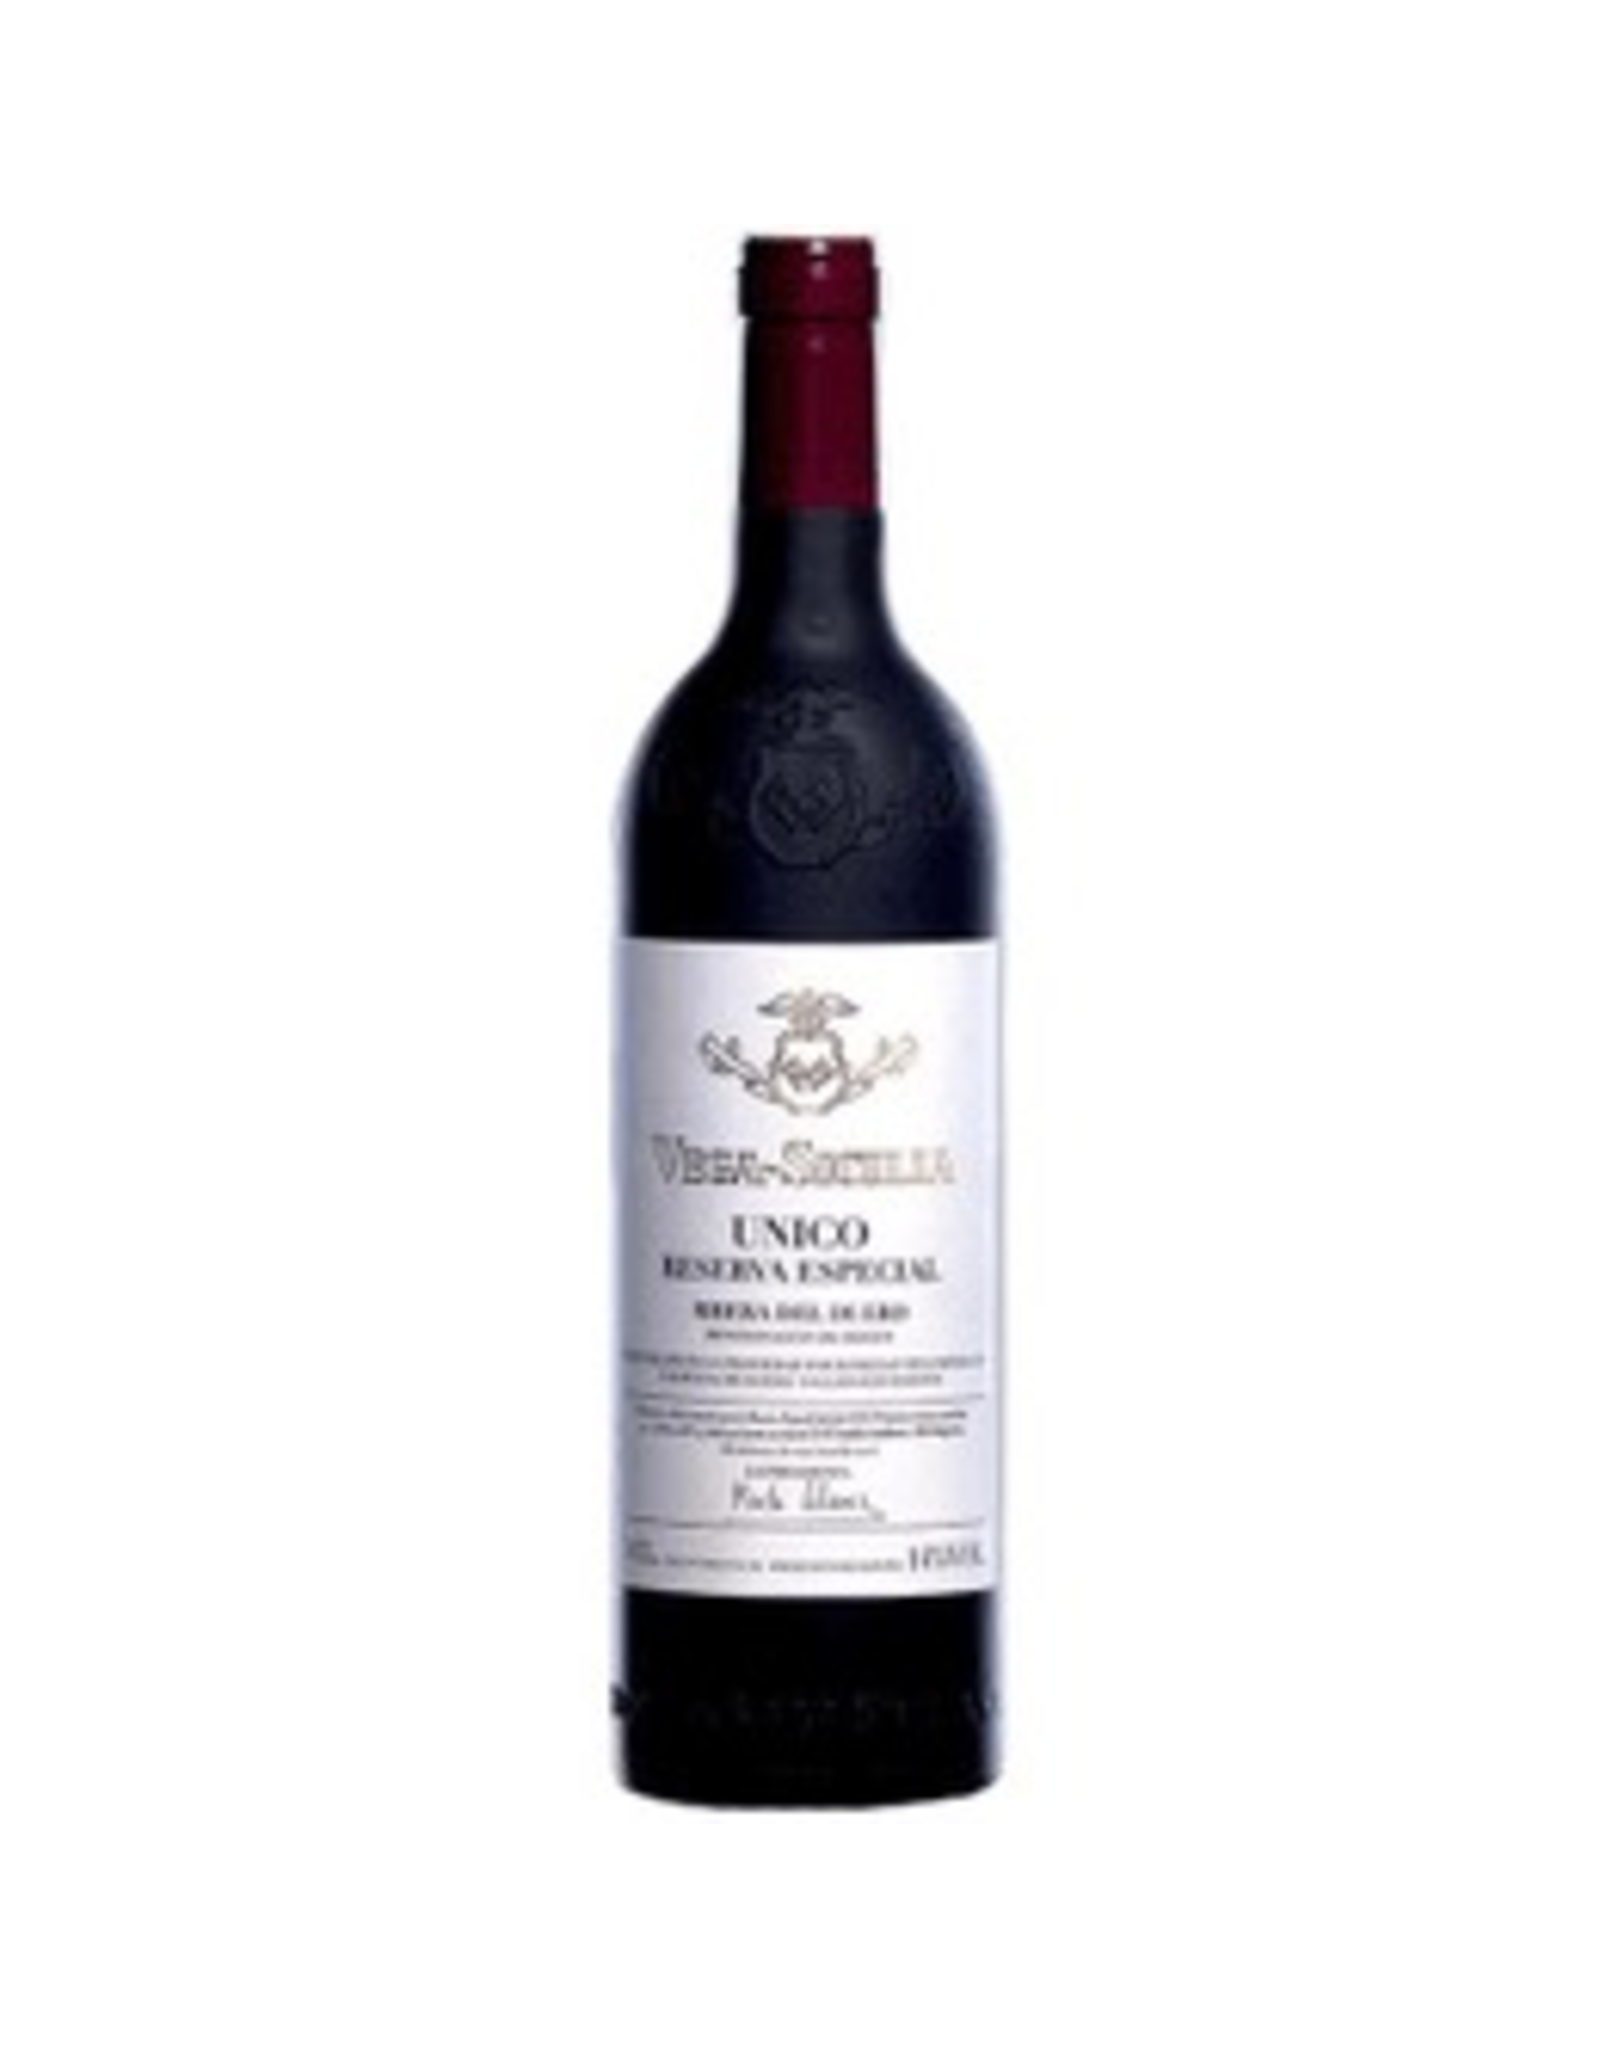 Red Wine 2020, Vega Sicilia UNICO Reserva Especial R20, Red Blend, Ribera Del Duero, Castilla y Leon, Spain, 14.5% Alc, CTnr RP98